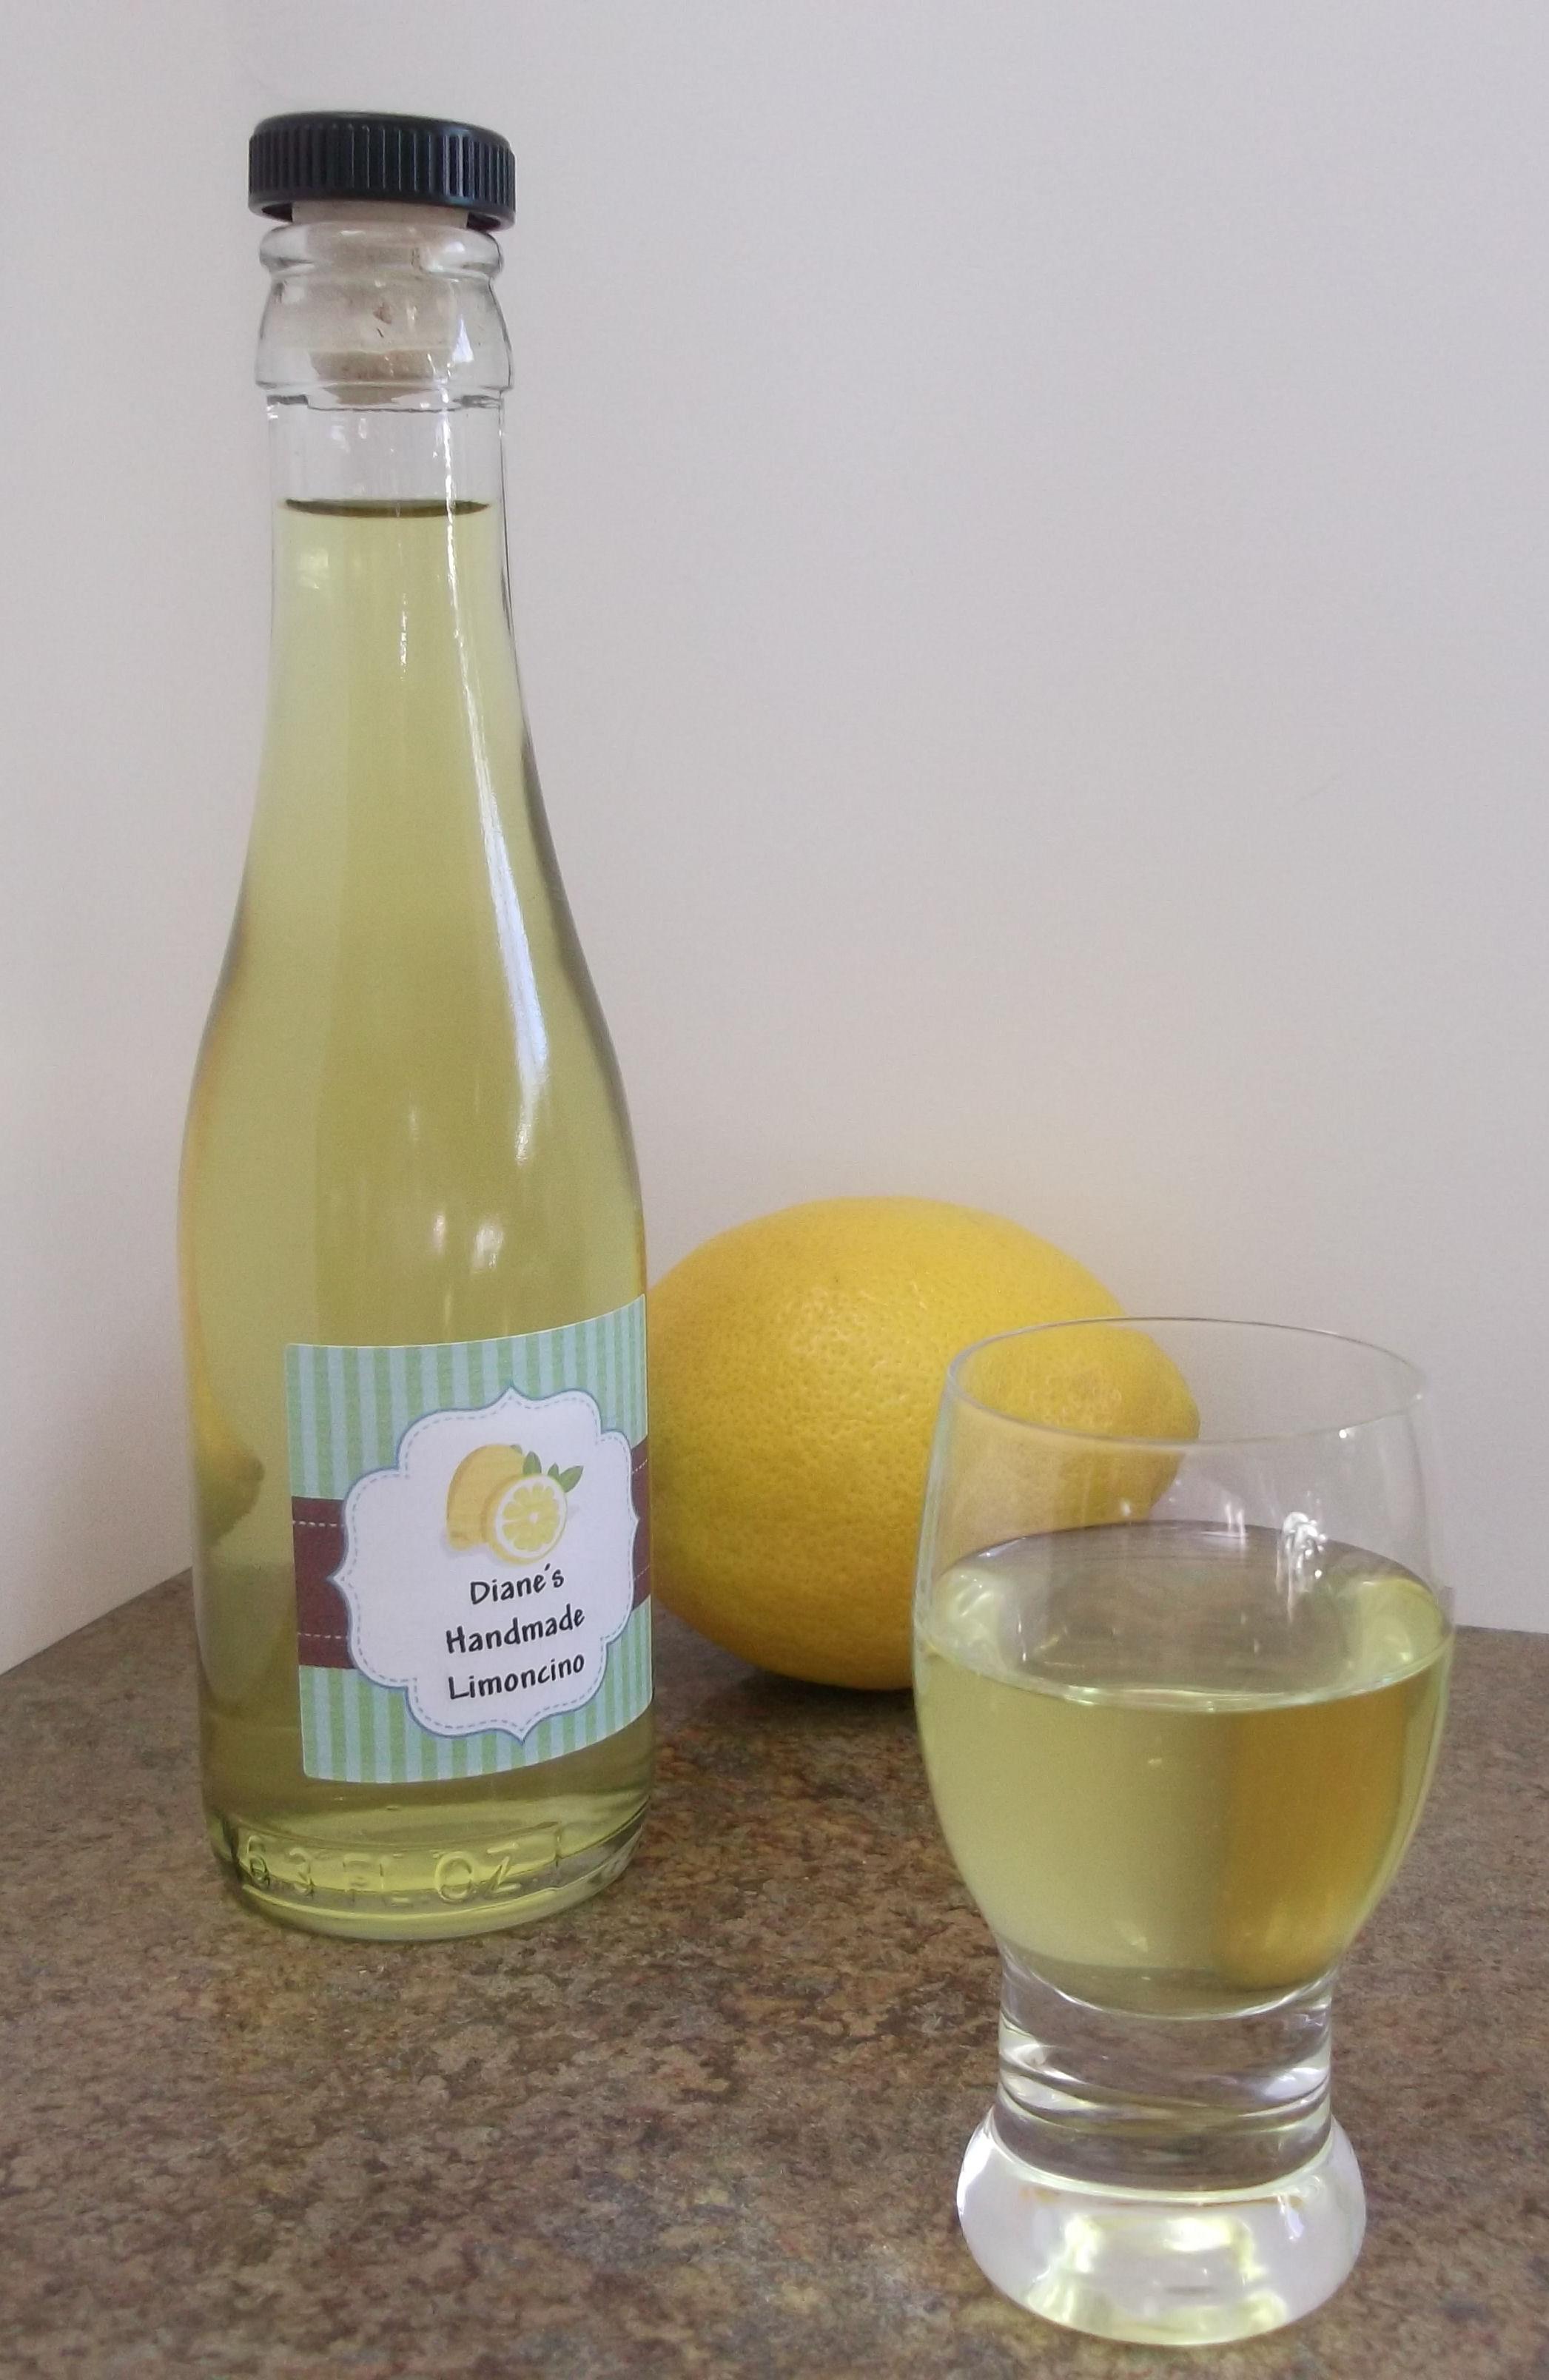 Limoncello limoncino unterschied und Zitronen Limoncello